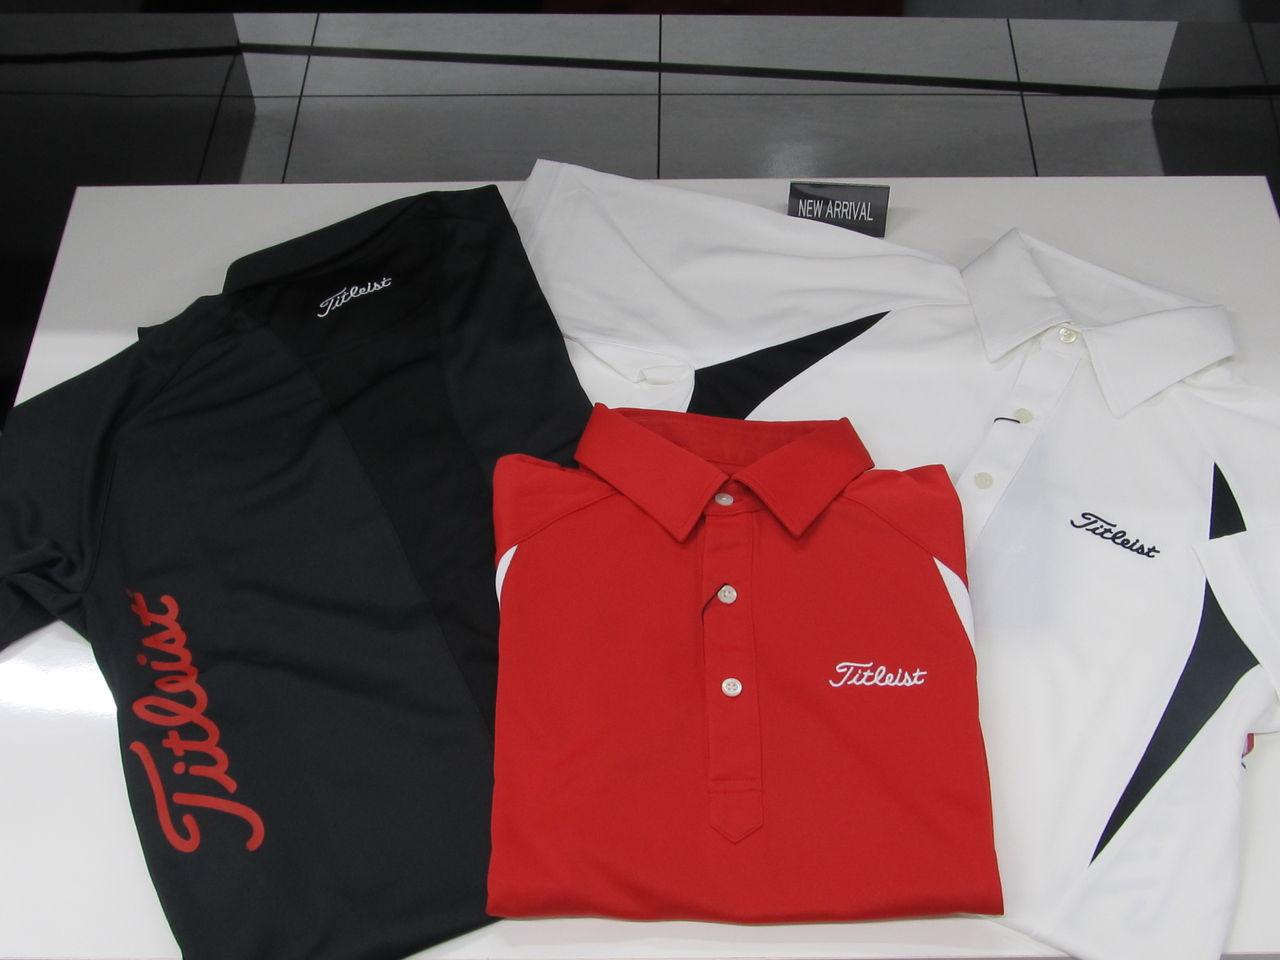 the japan golf titleist japan introduces apparel